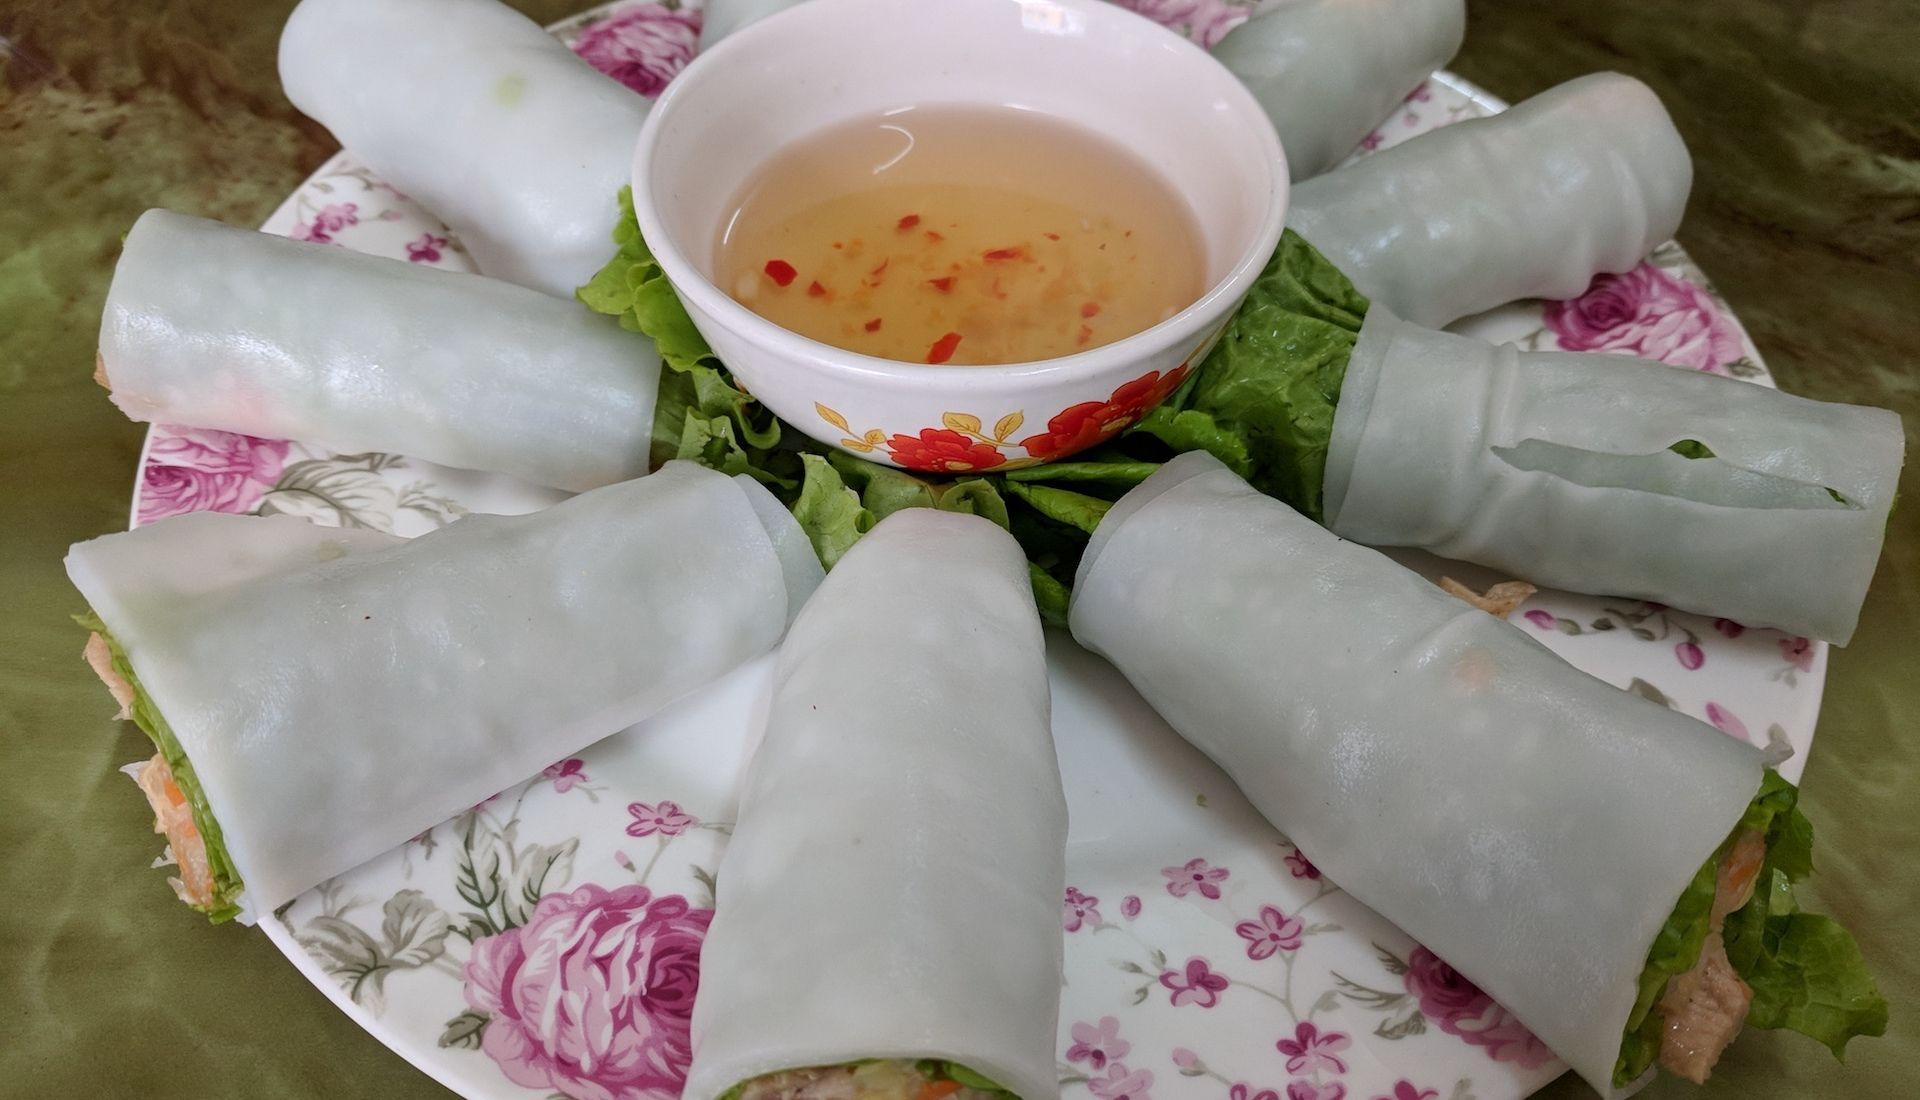 Trung Tuyet Restaurant in Ninh Binh